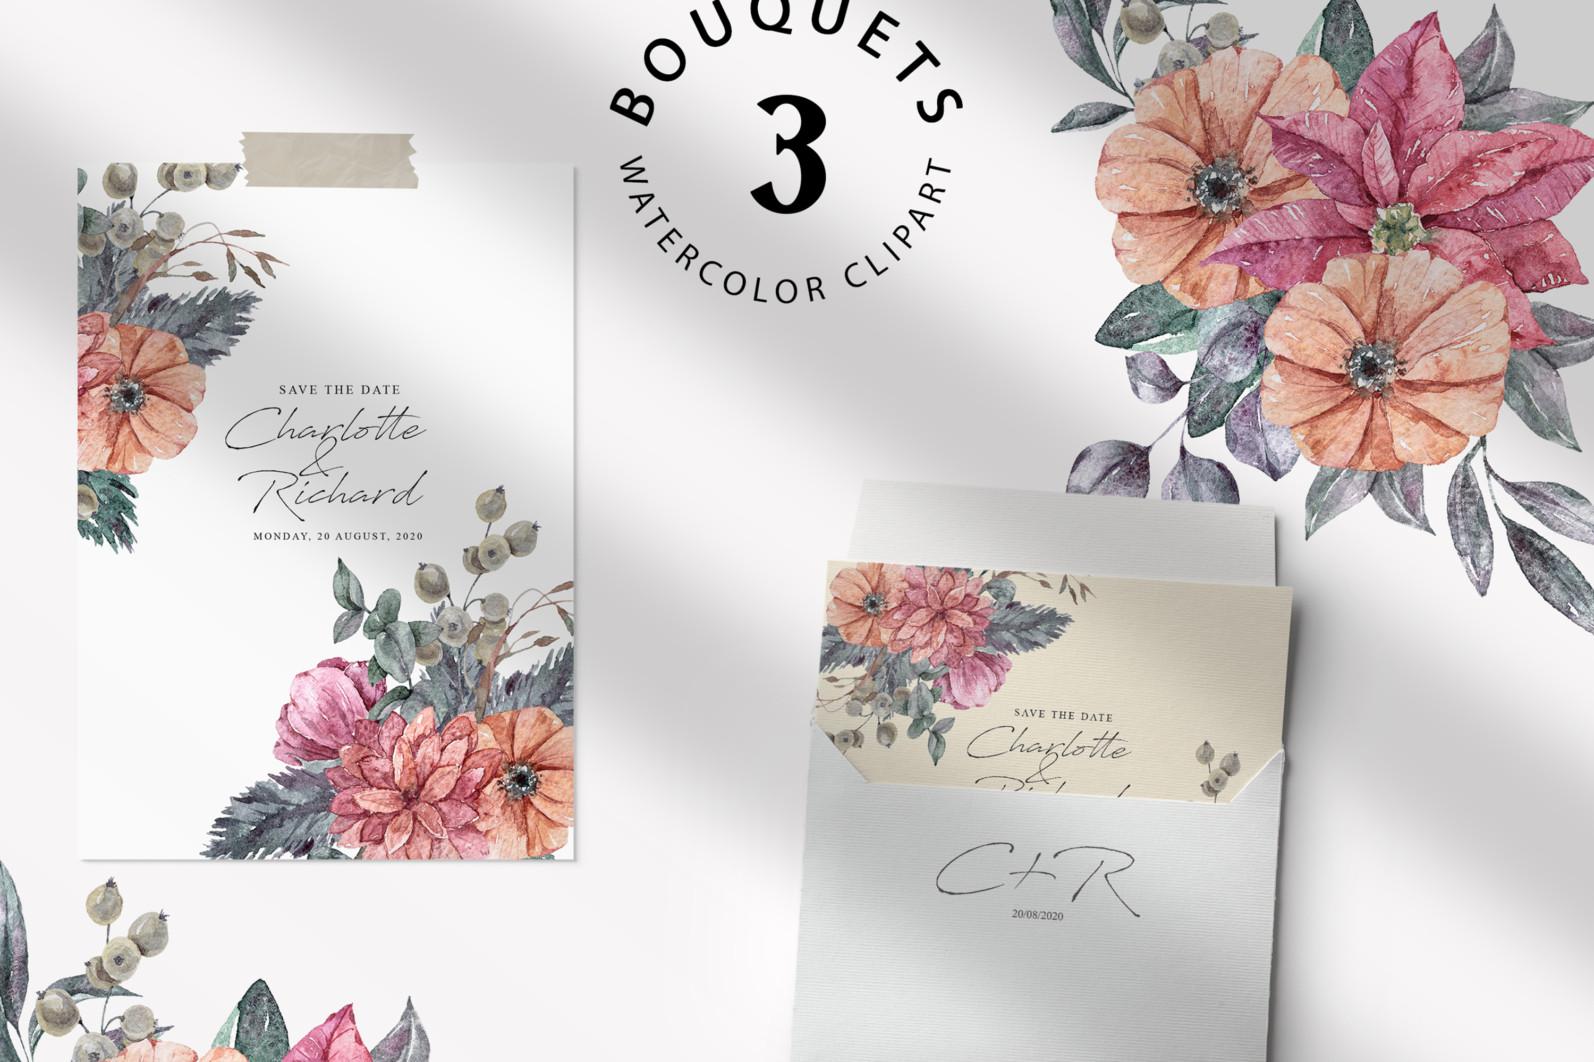 Floral bouquets sublimation / clipart- 3 png files - preview bouquets 2 scaled -